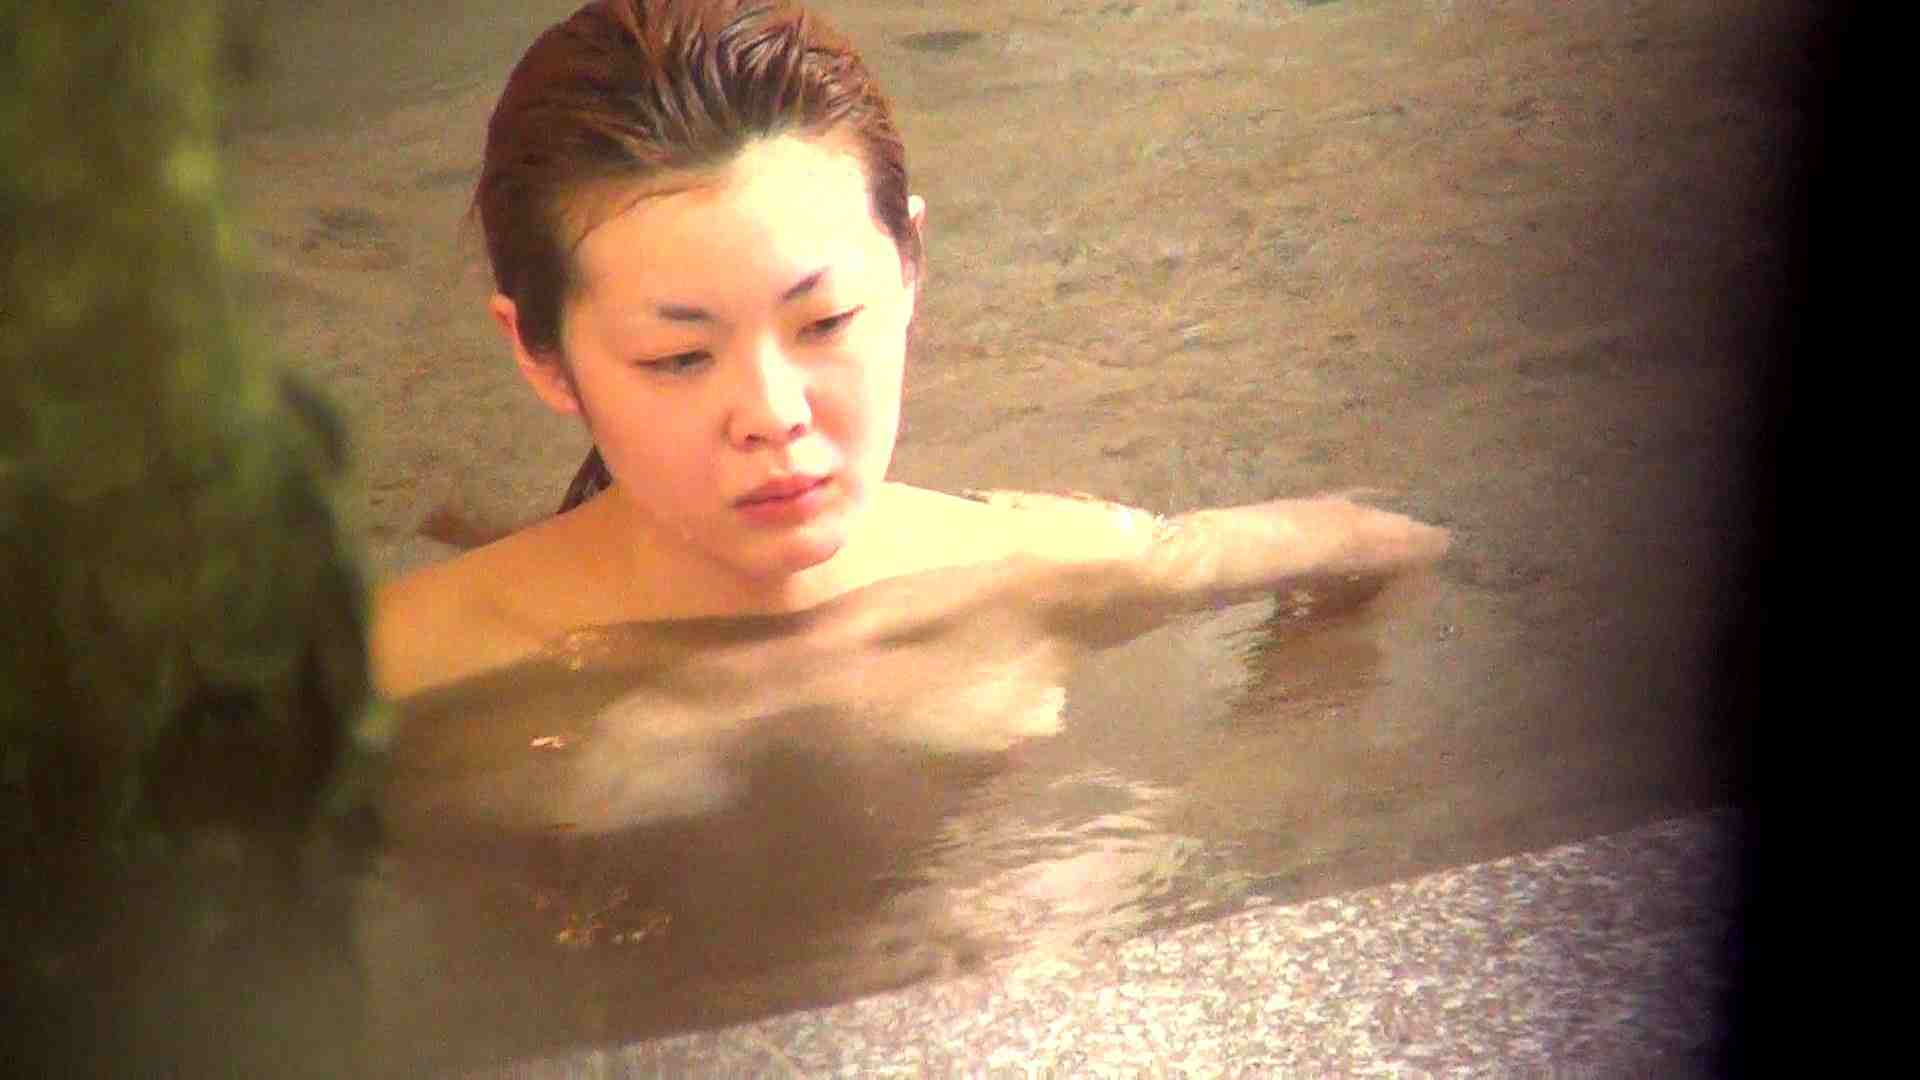 Aquaな露天風呂Vol.288 盗撮シリーズ | 露天風呂編  79PIX 69